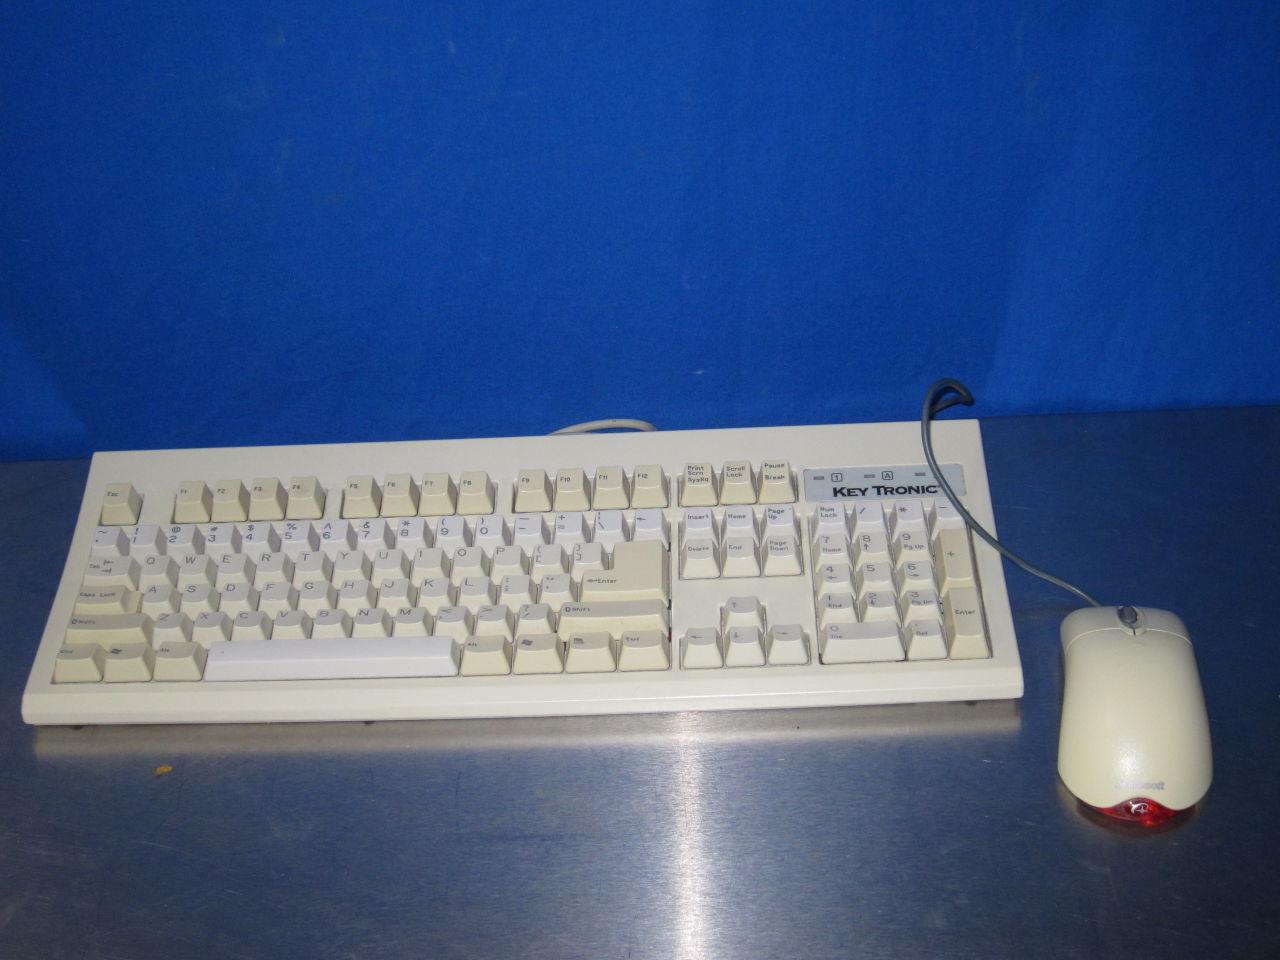 KEYTRONIC/MICROSOFT Various Keyboard, Mouse